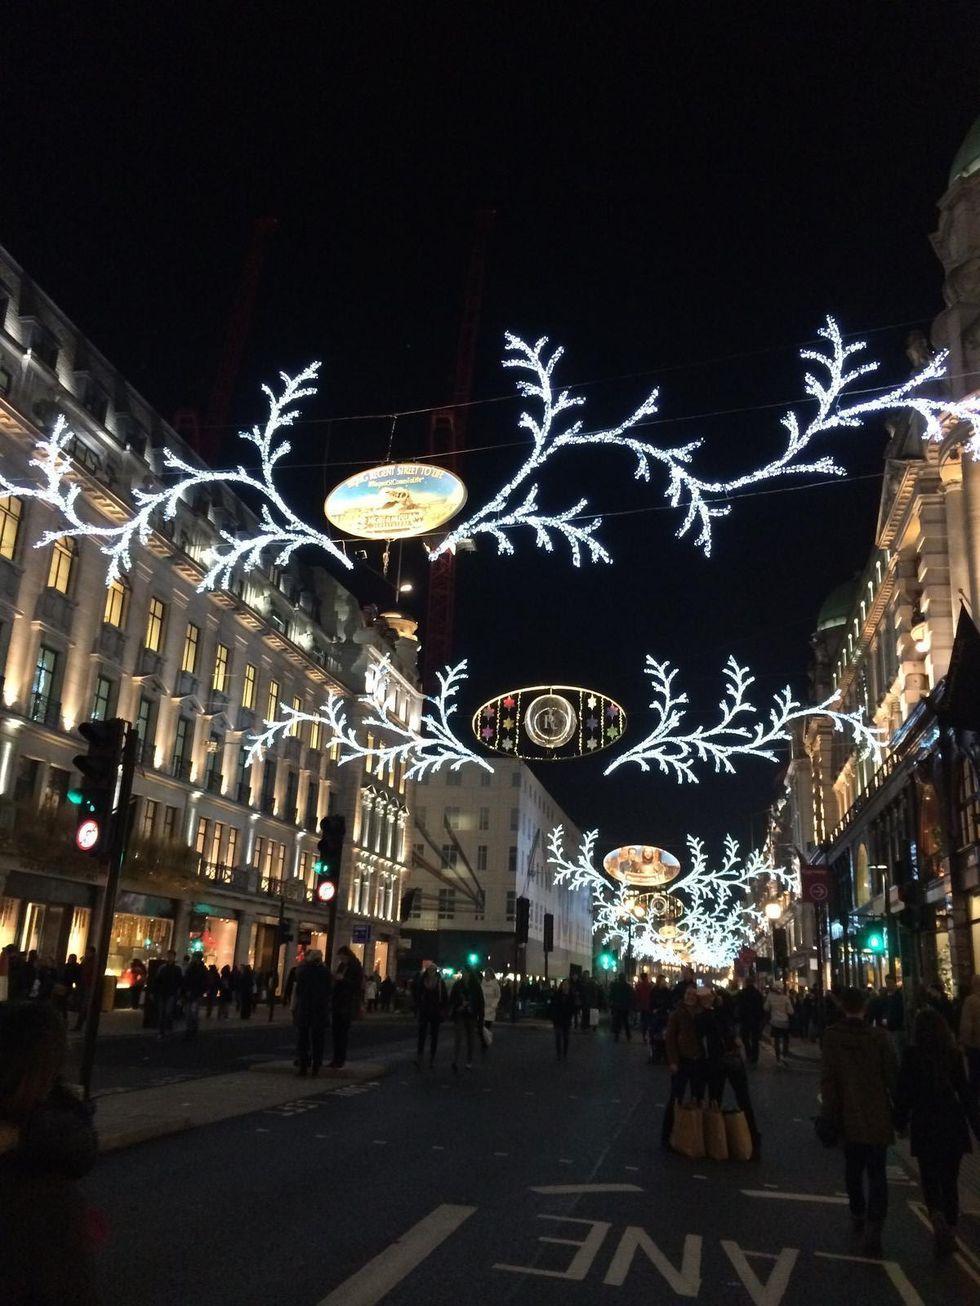 Hela varlden ryms i london